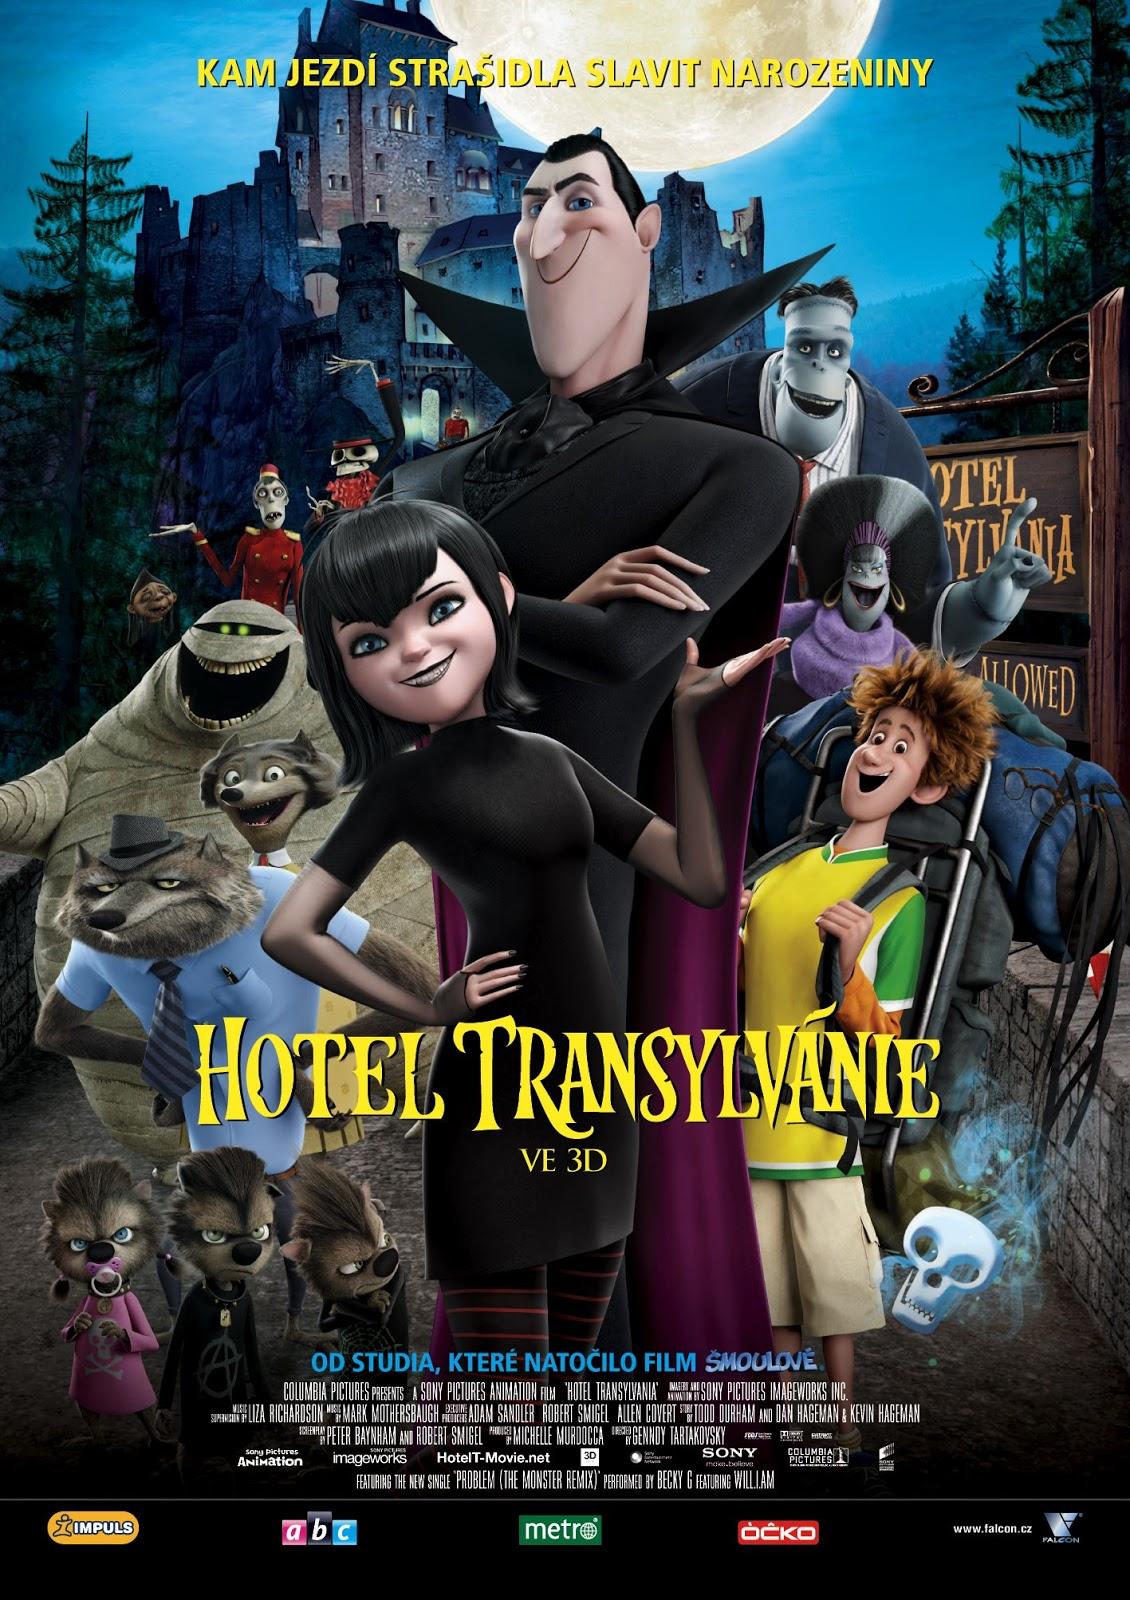 Hotel Transylvania  โรงแรมผีหนีไปพักร้อน [HD][พากย์ไทย]